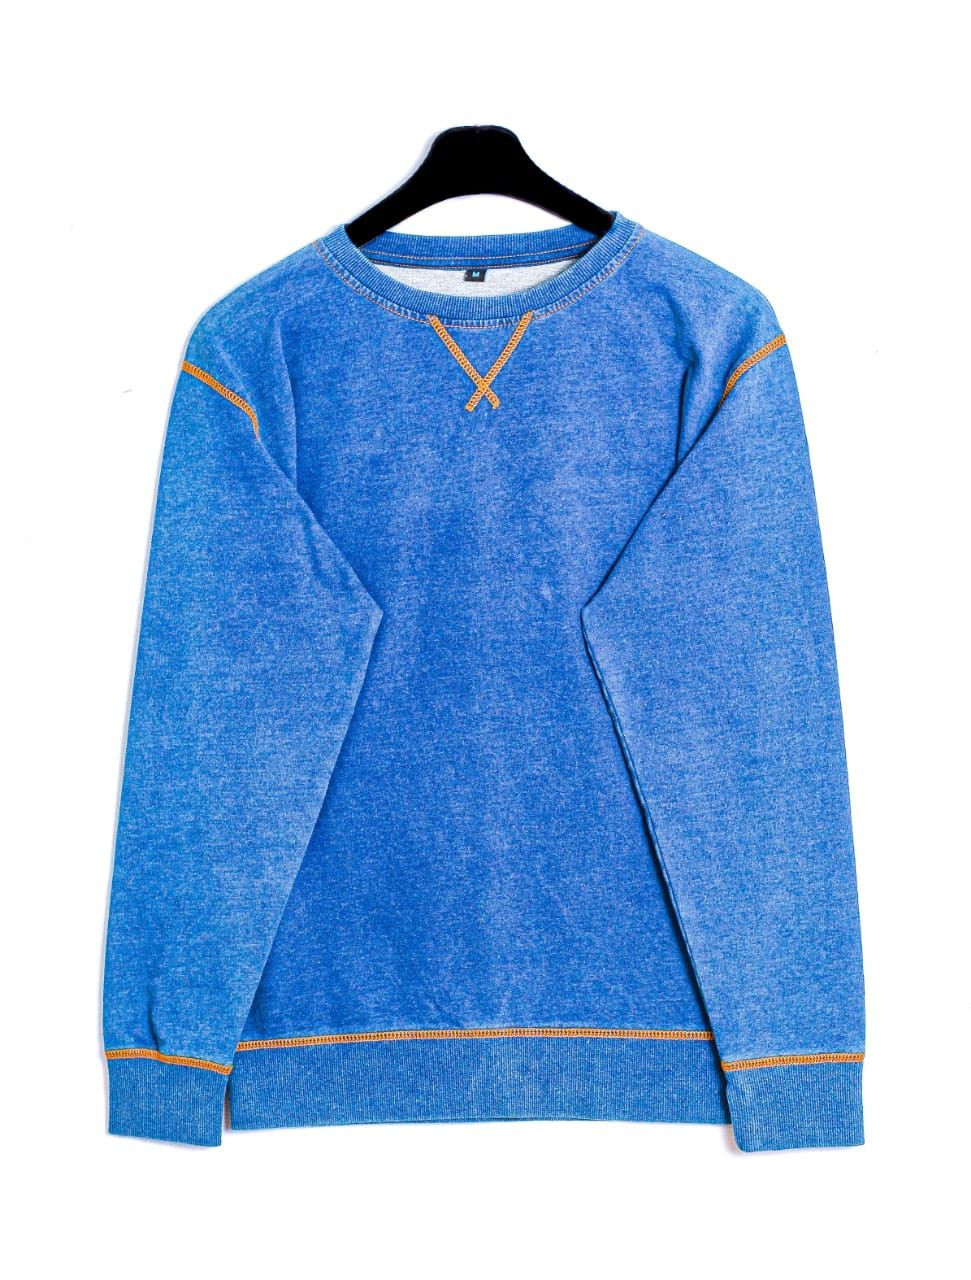 High Quality Customized Men's/women's Sweatshirt